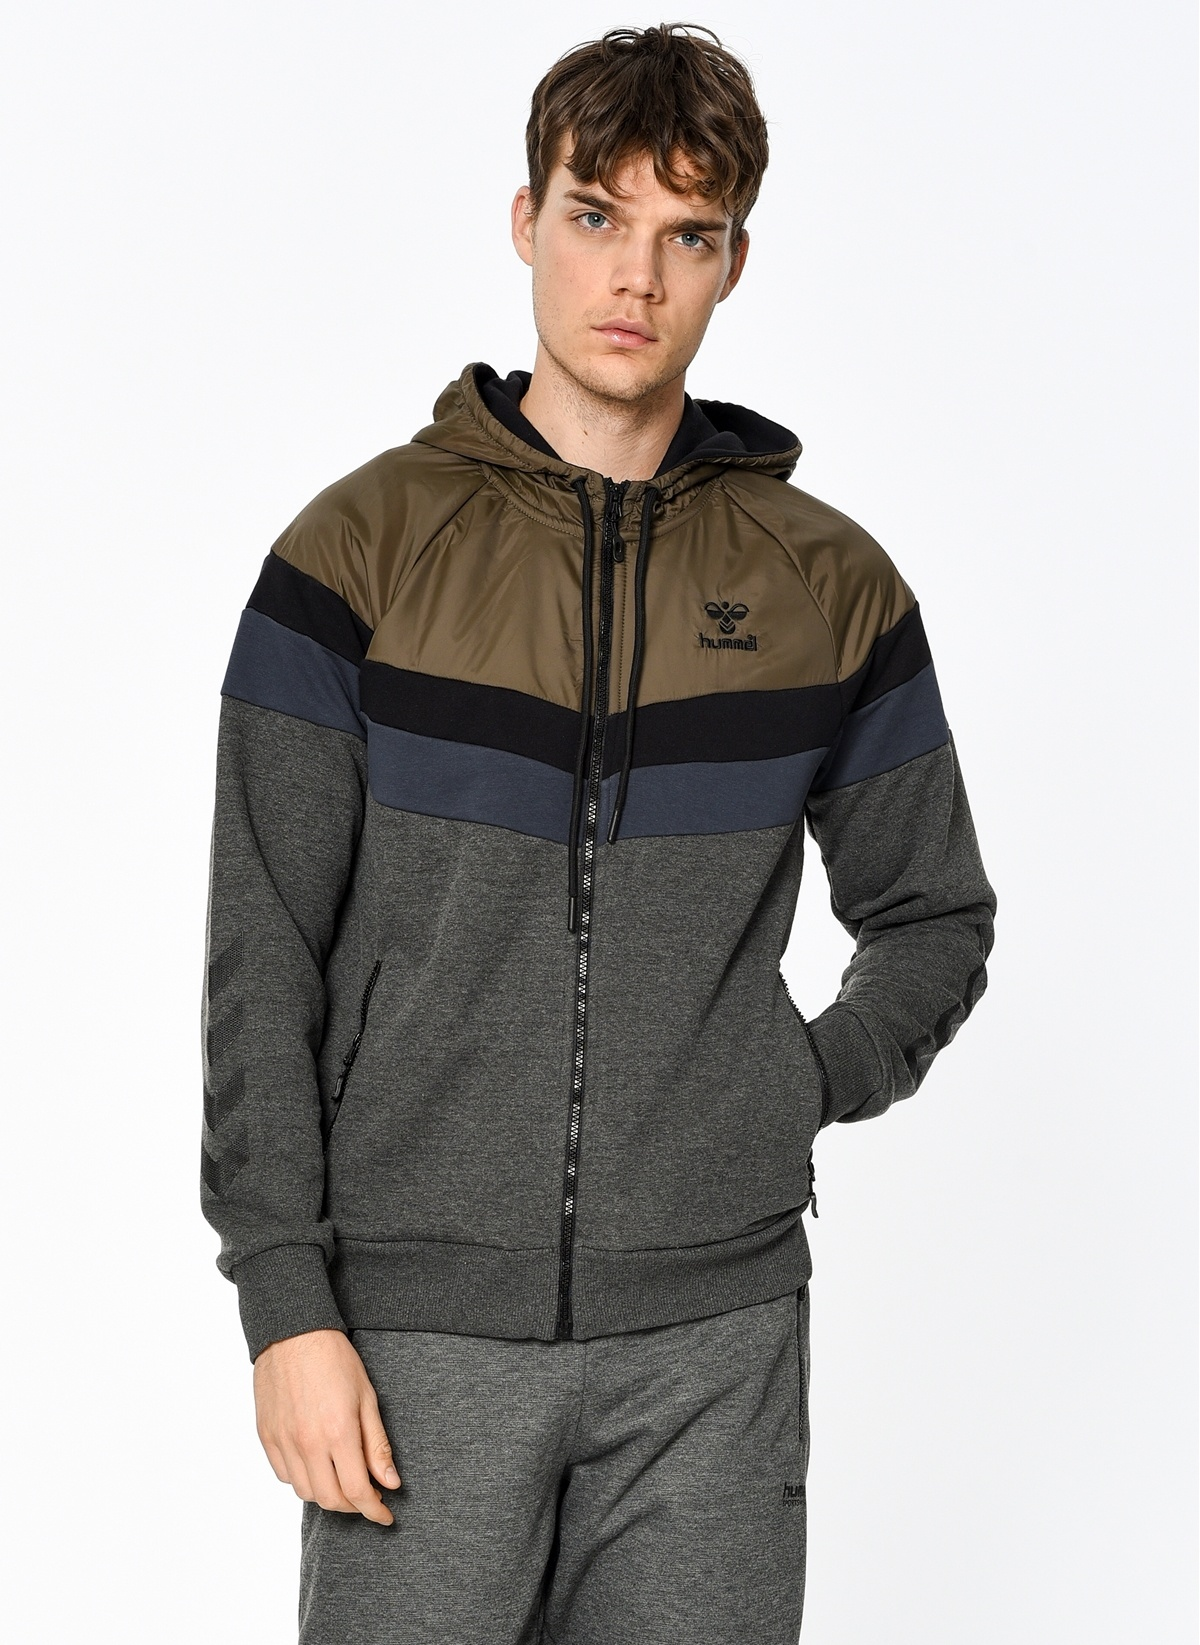 Hummel Fermuarlı Kapüşonlu Sweatshirt T37320-2508 August Zip Hoodie – 229.95 TL